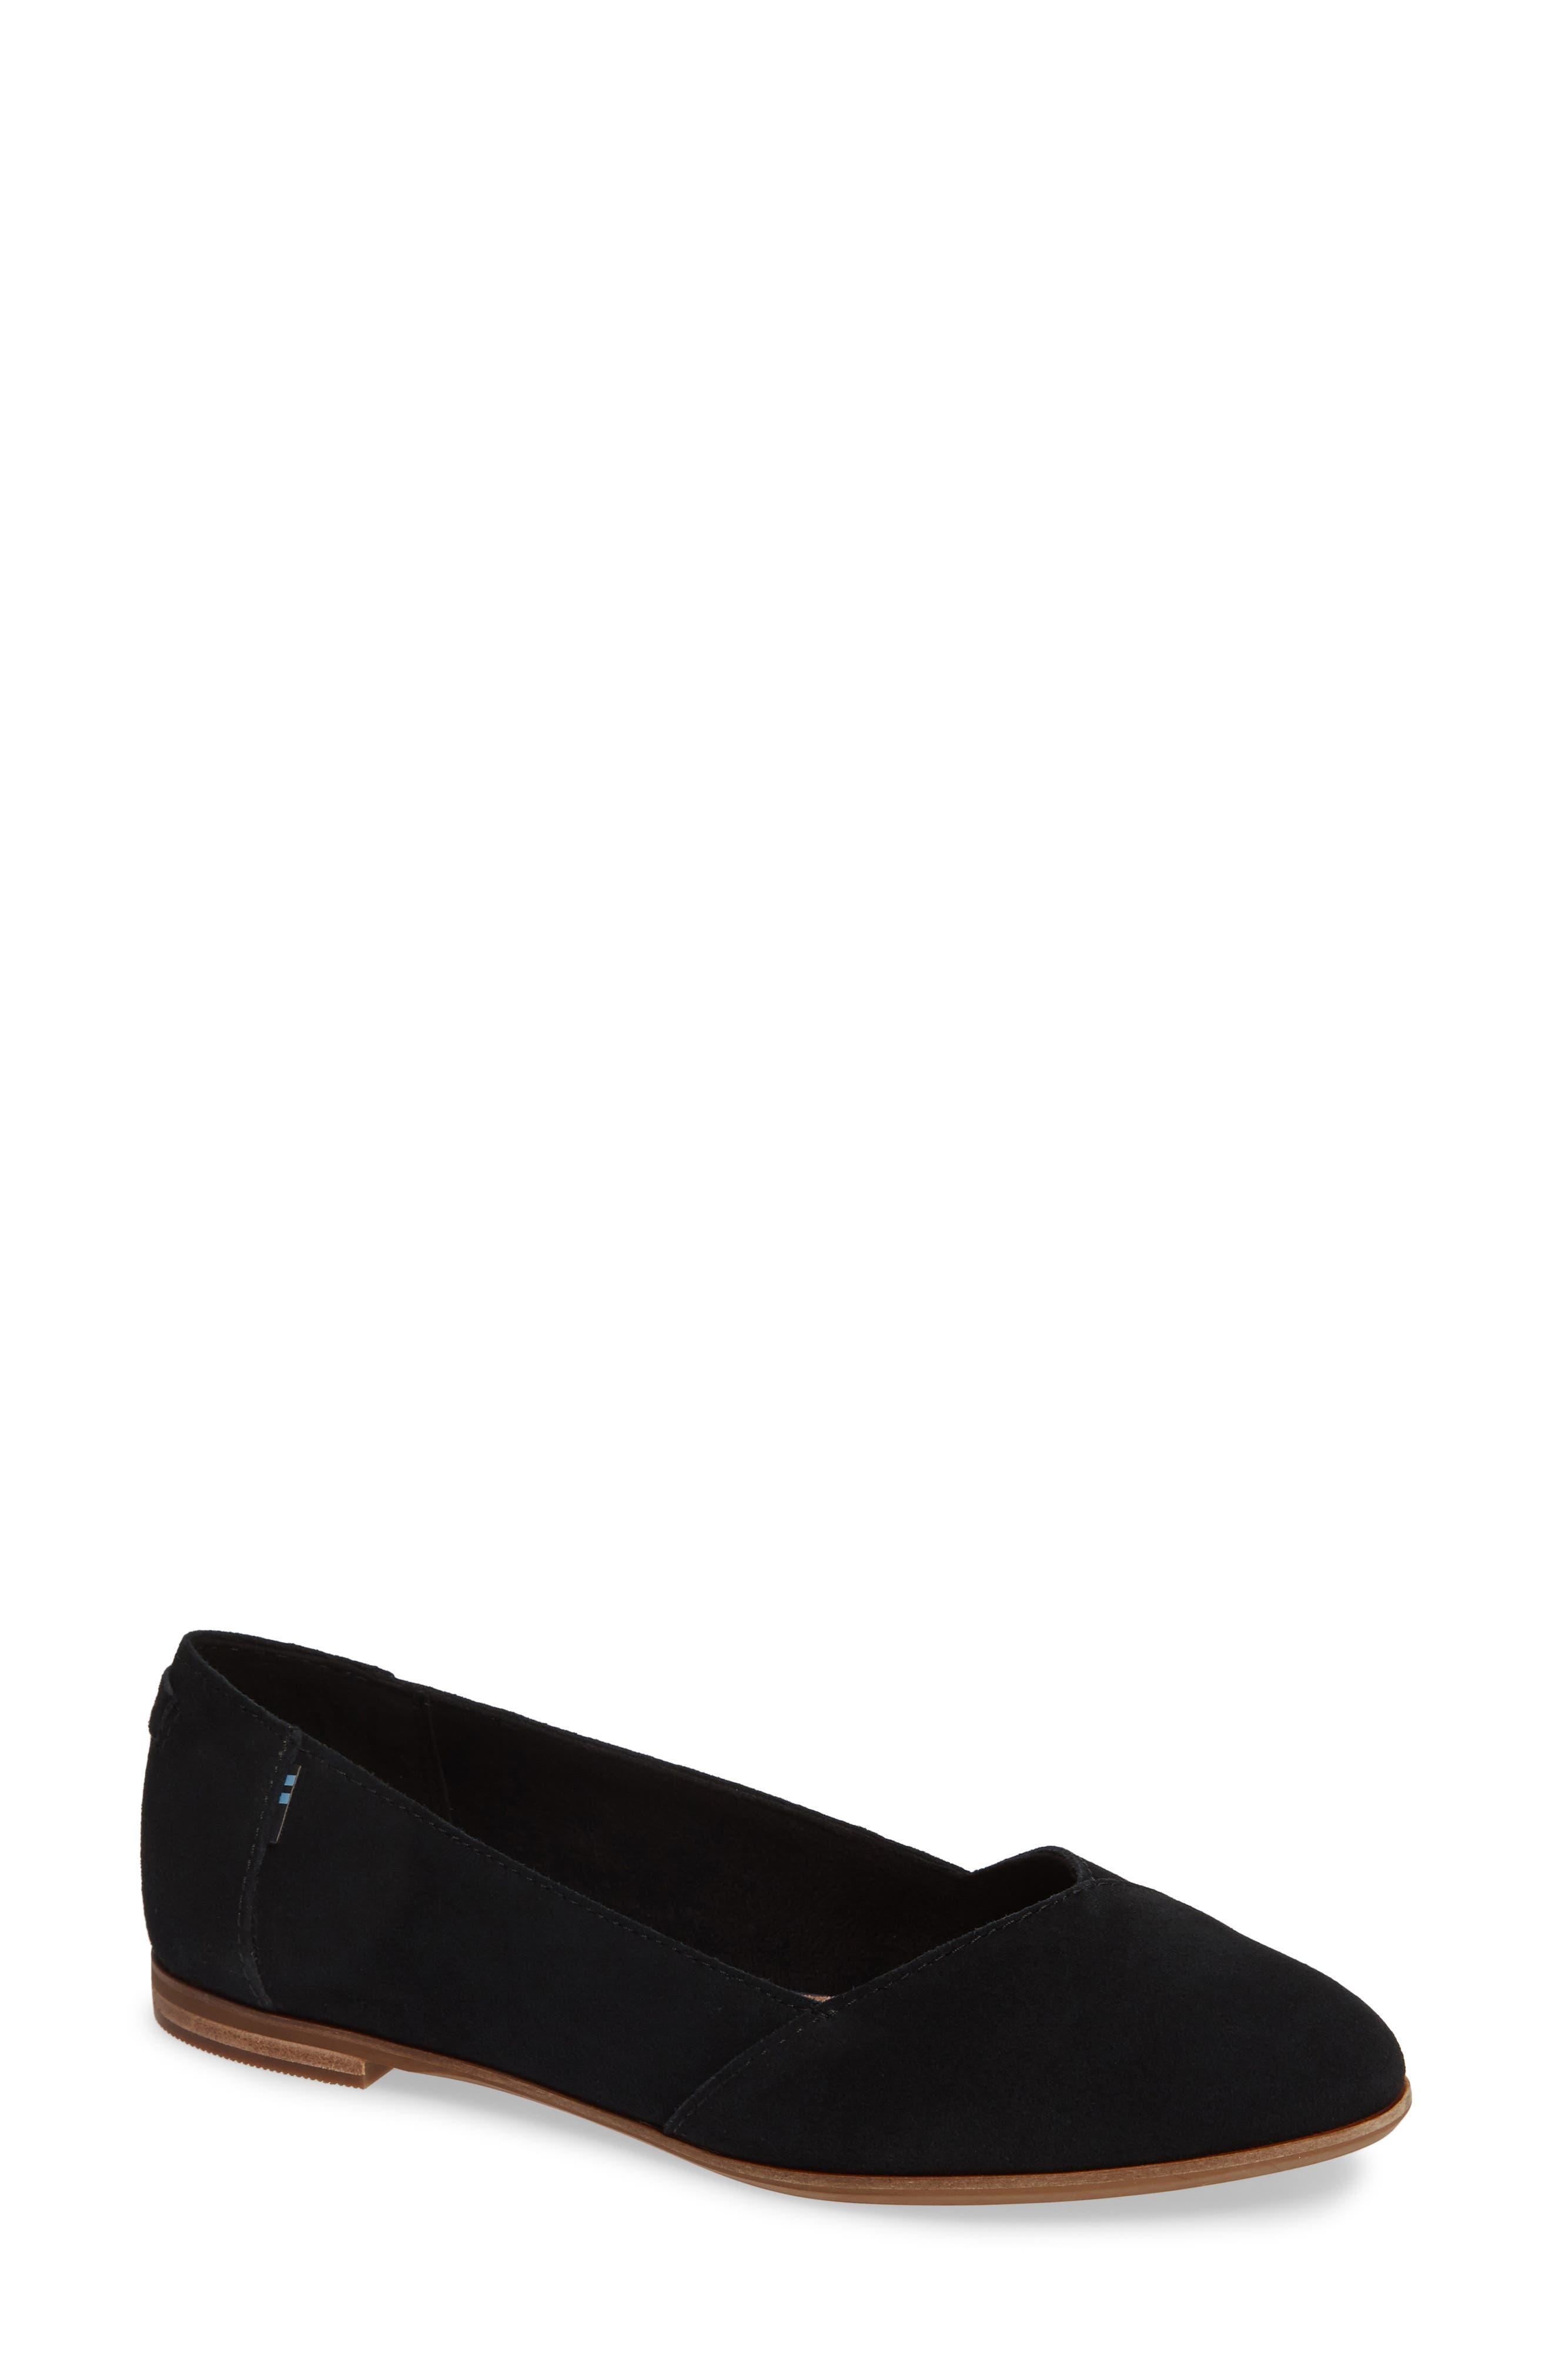 Toms Julie Almond Toe Flat B - Black